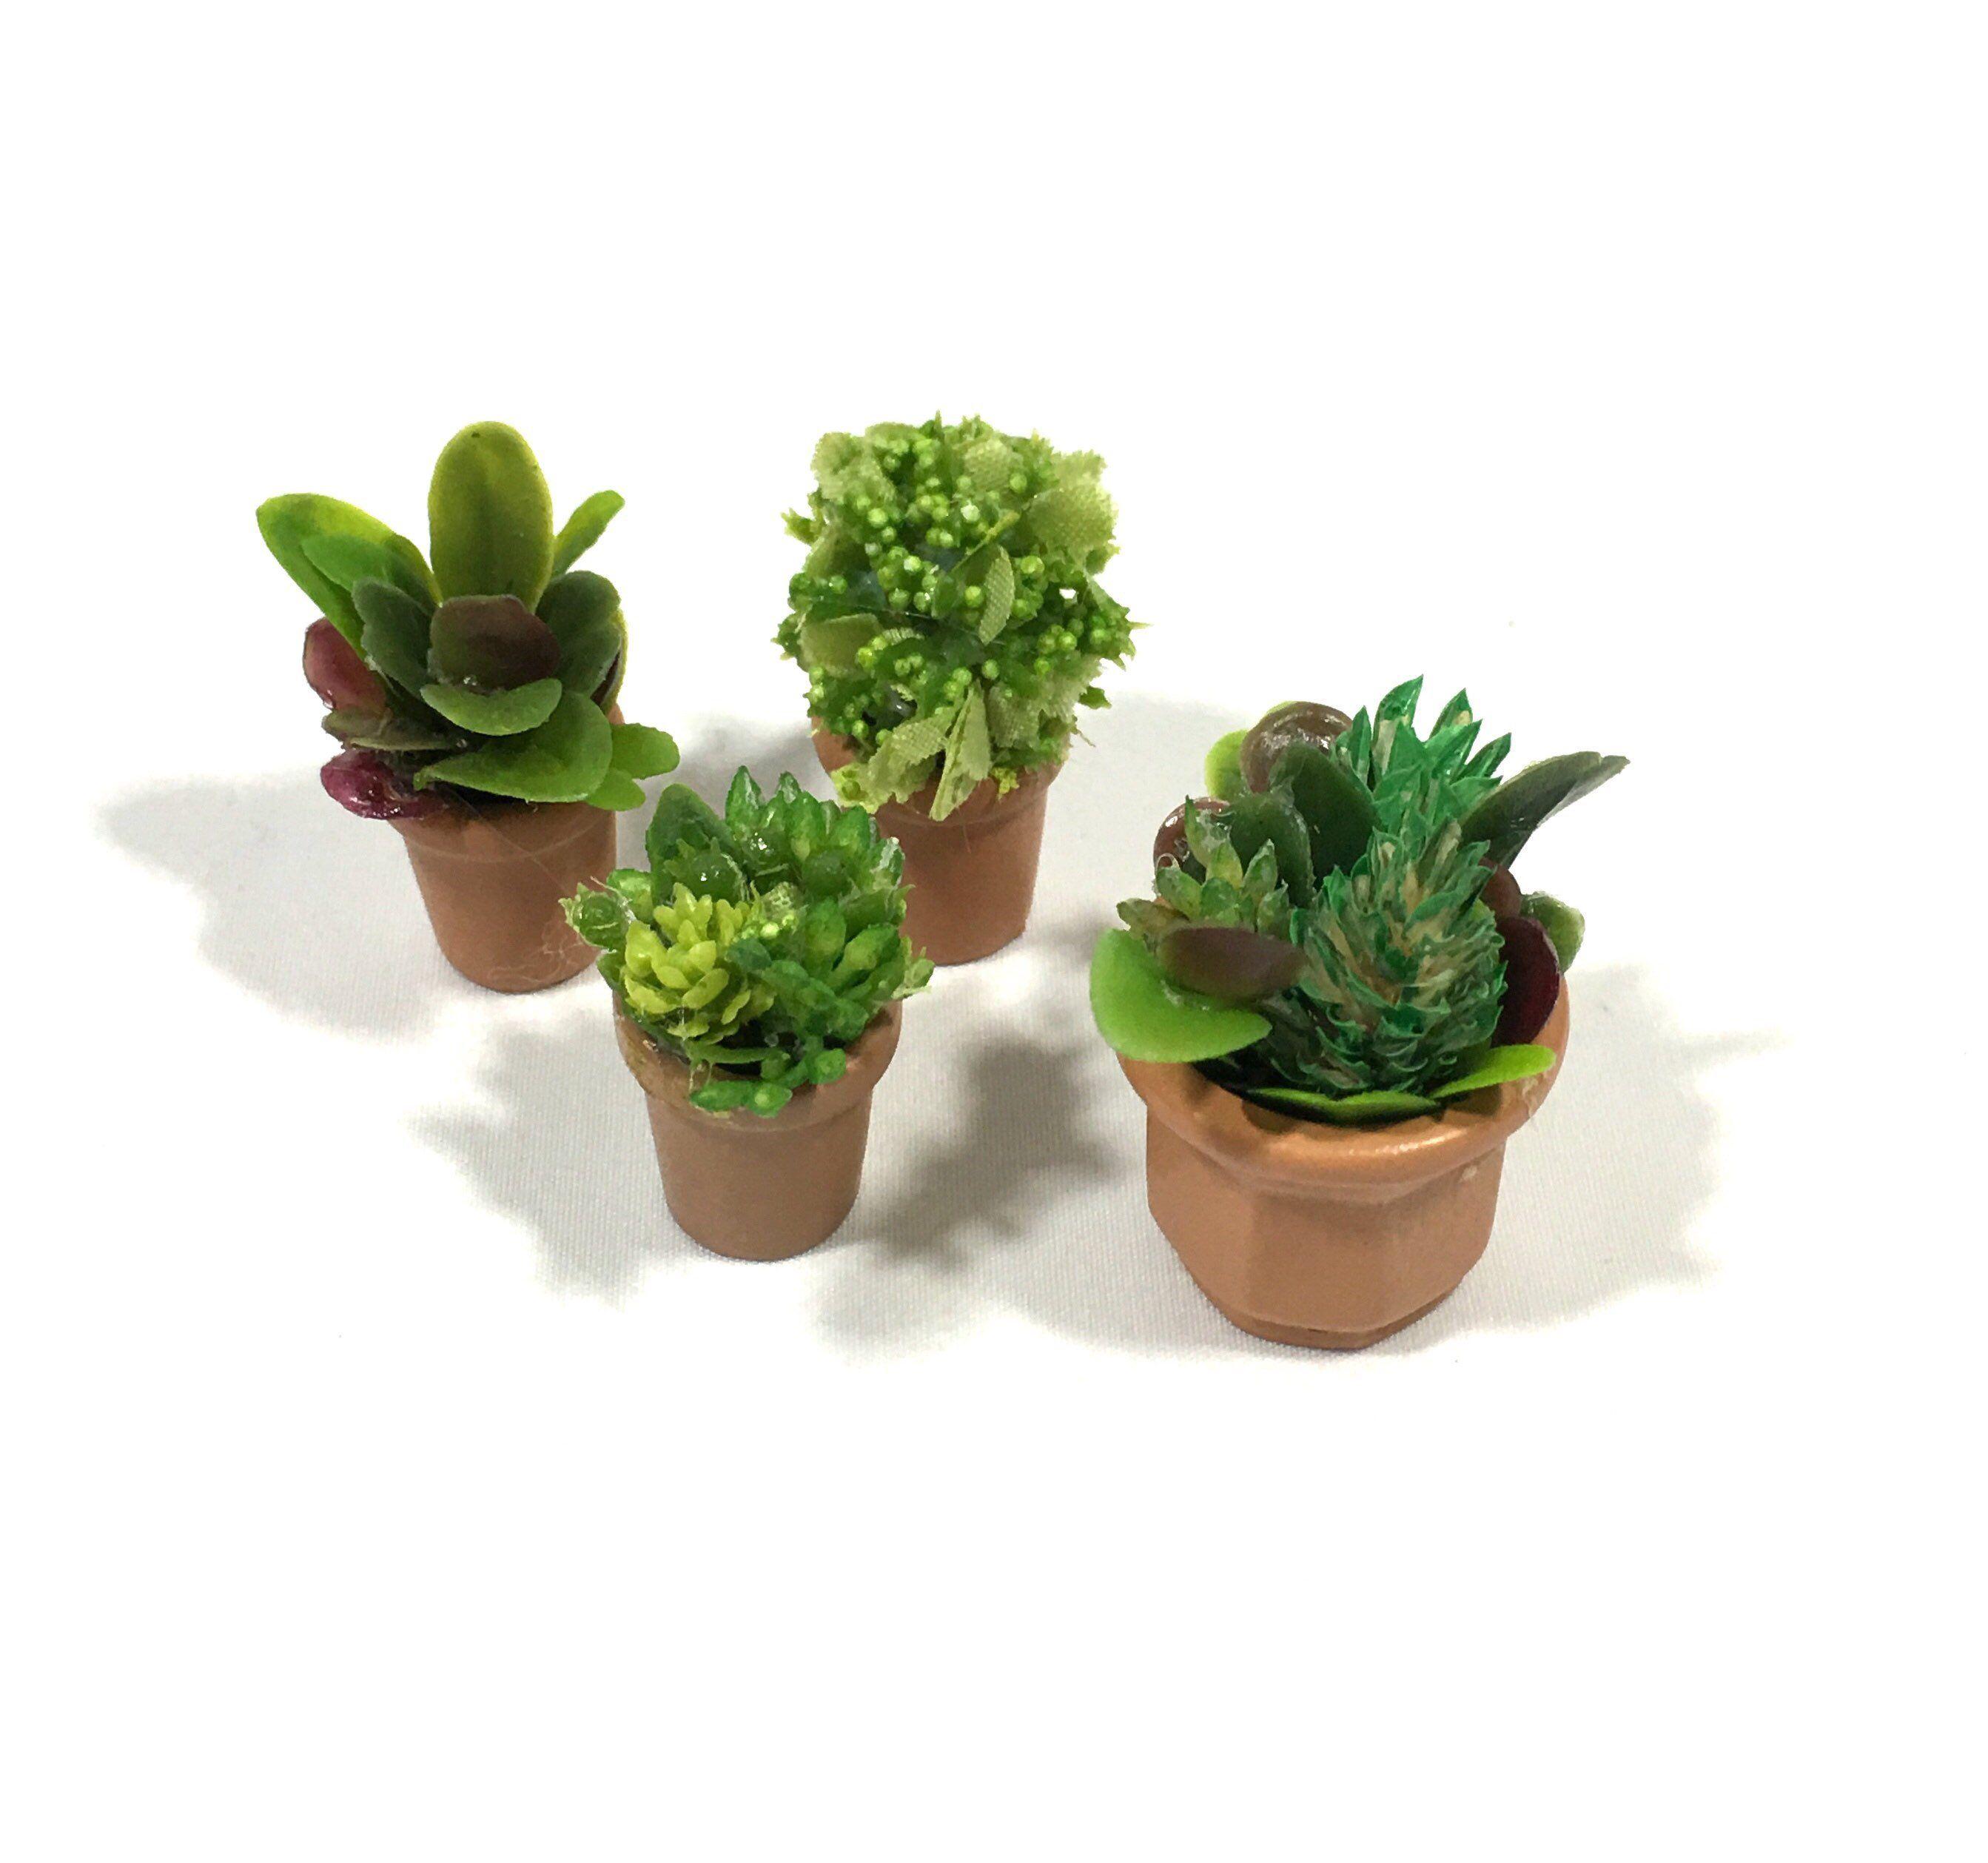 Dollhouse Potted Plant Miniature Fairy Garden